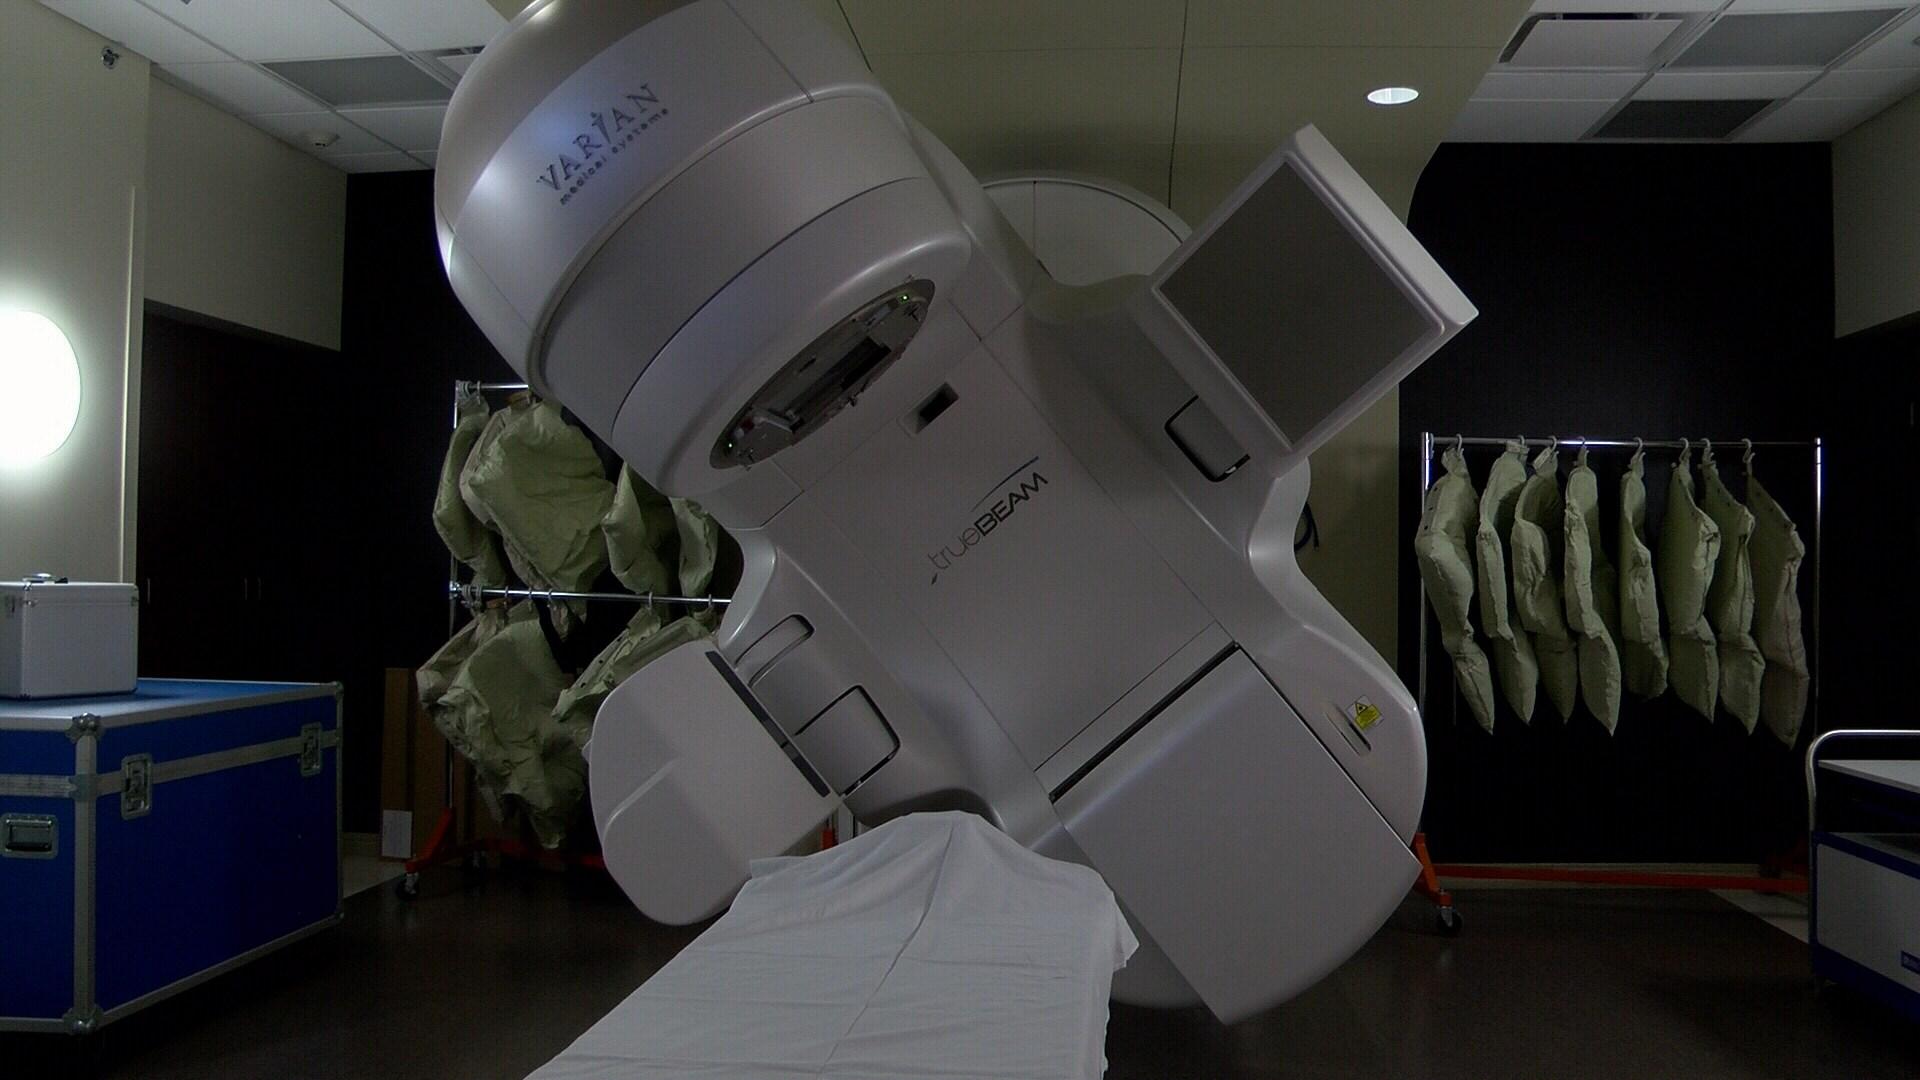 Traditional radiation